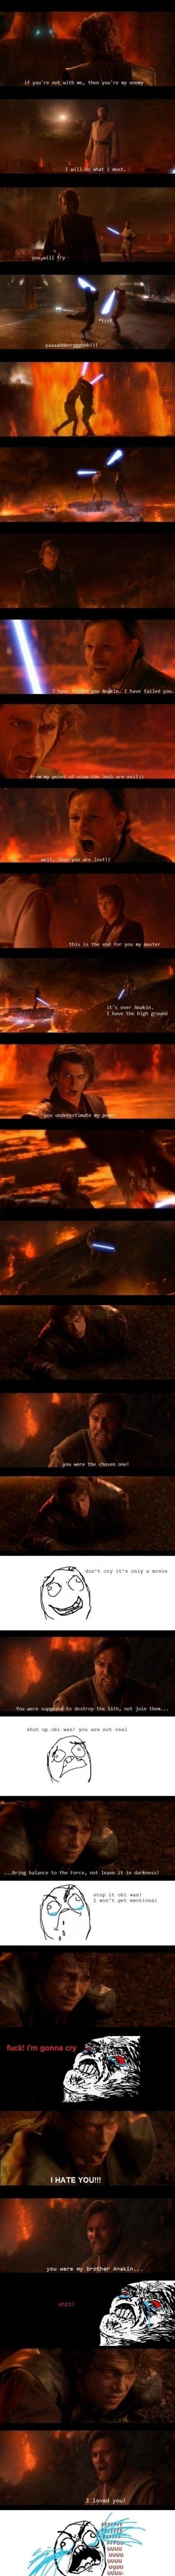 LOLPics   Star Wars meme lol memes